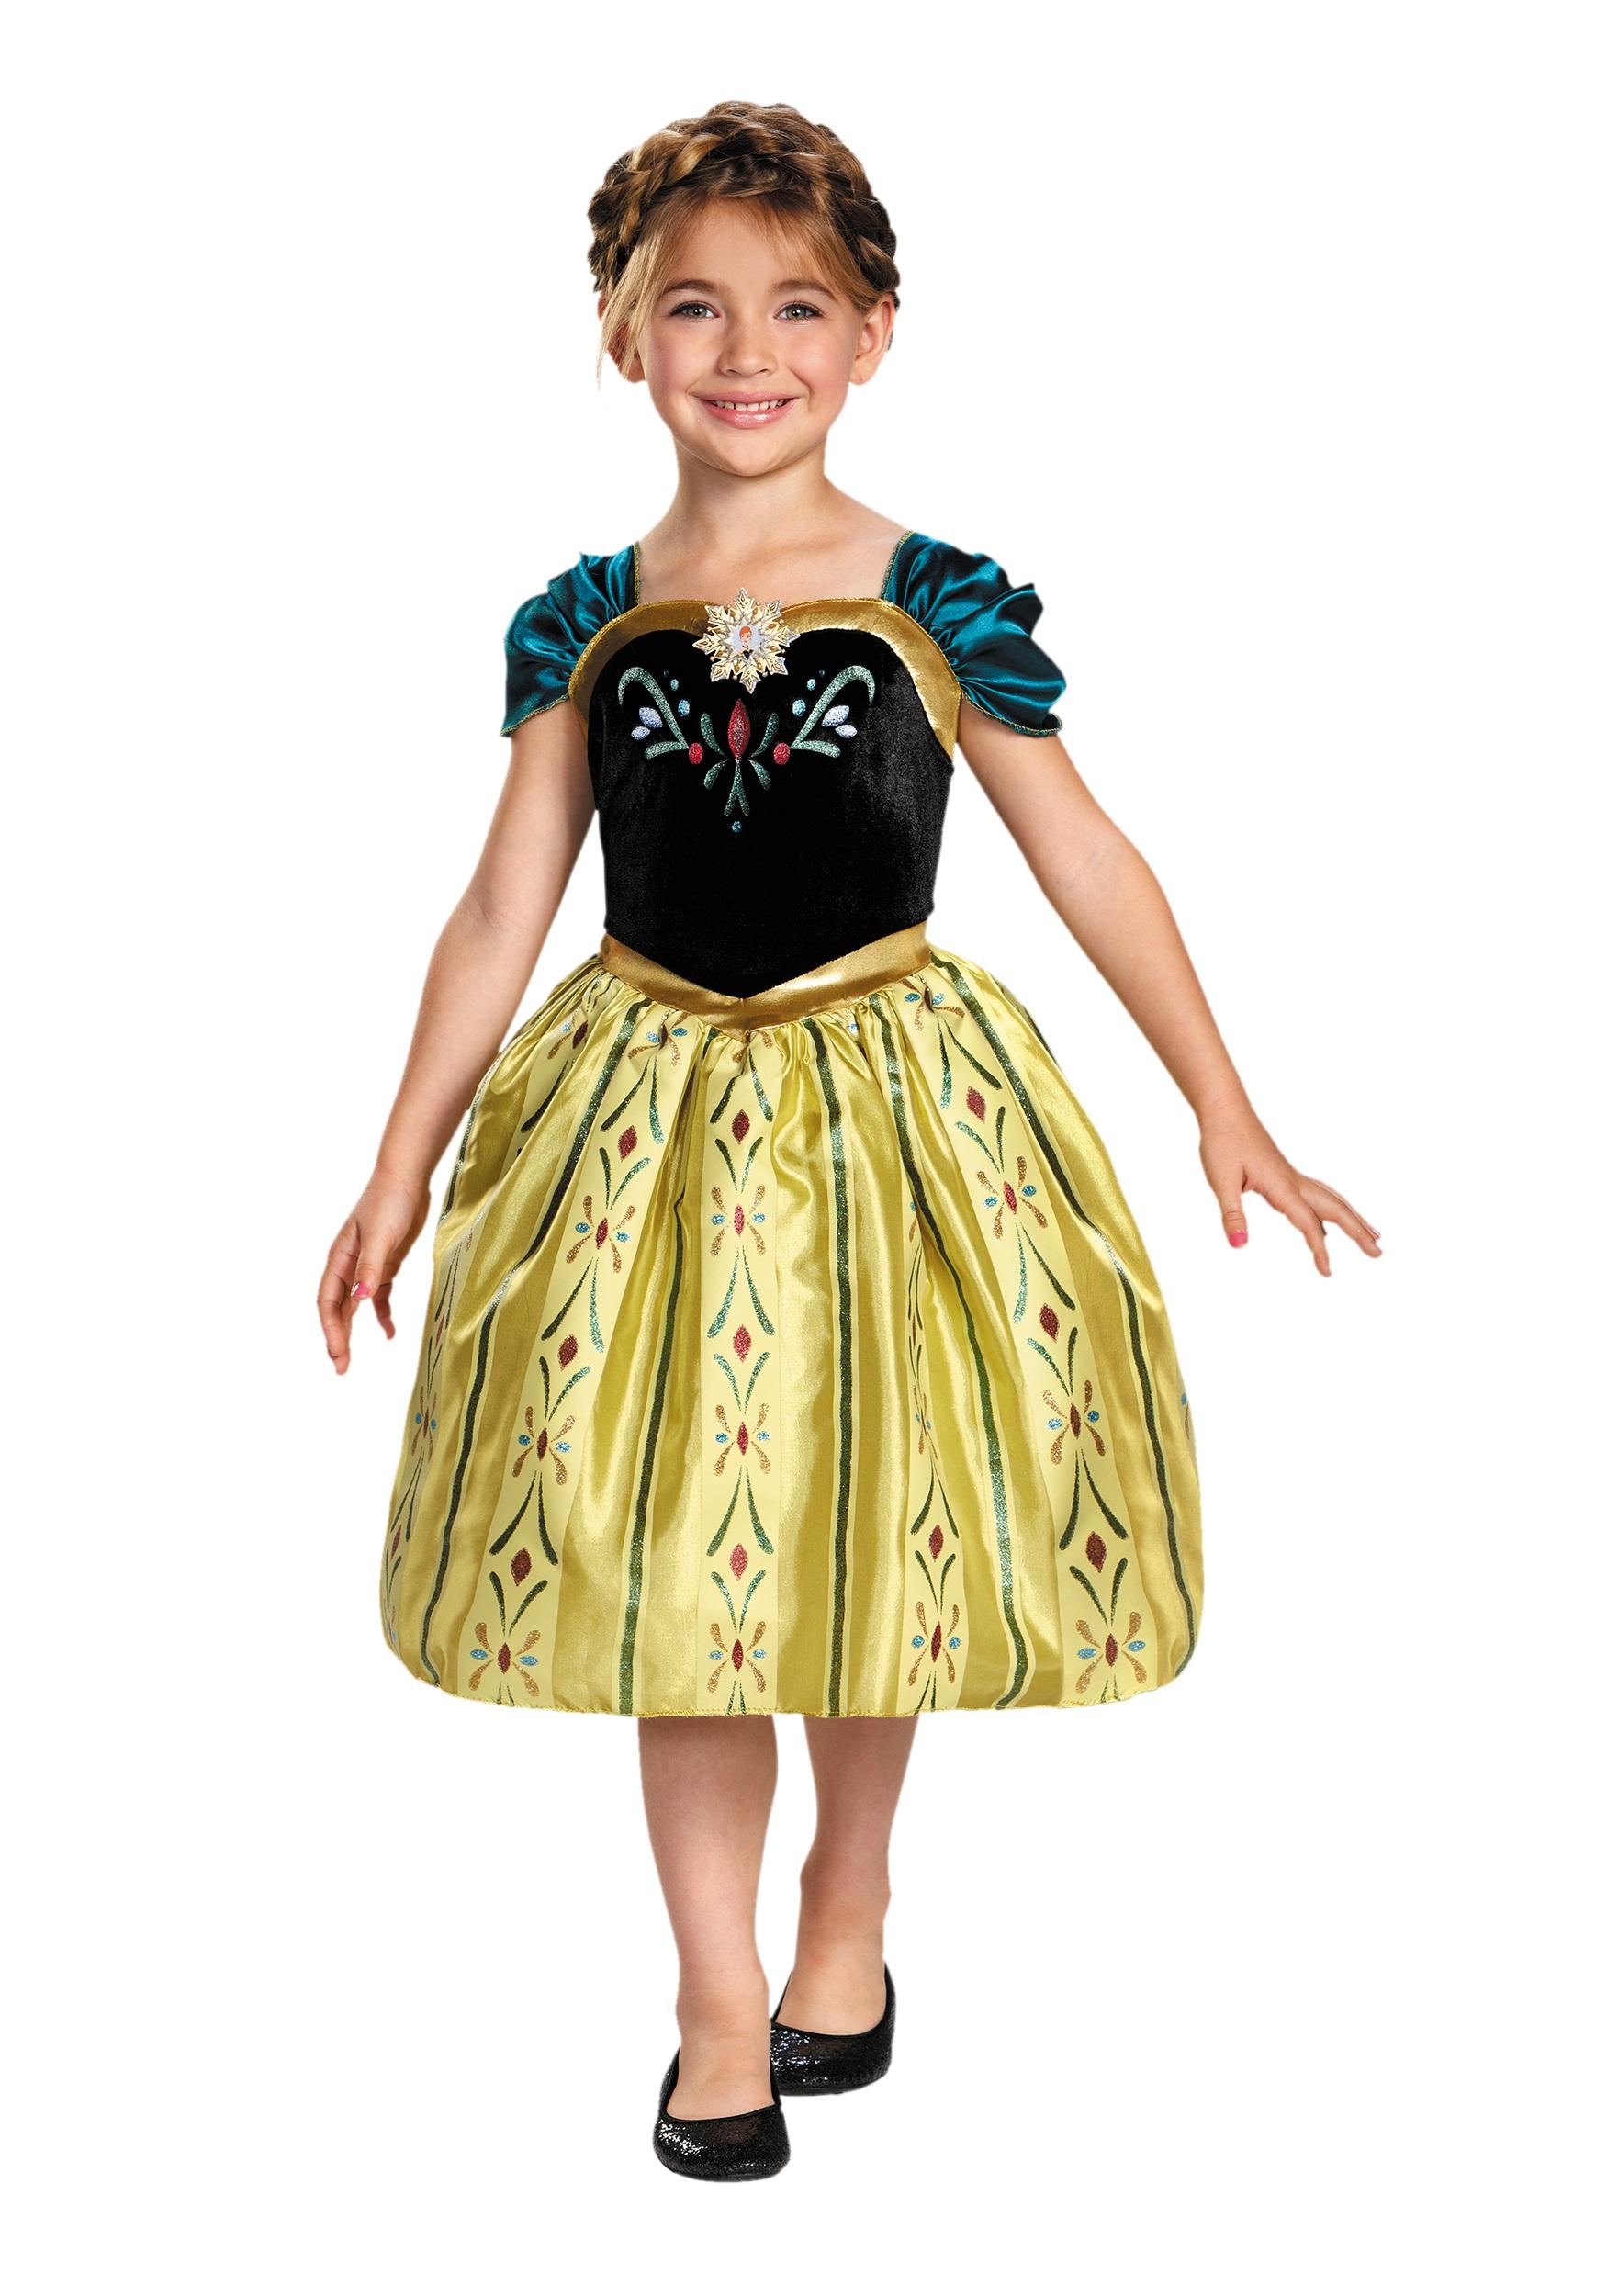 Girls Frozen Classic Anna Coronation Dress  sc 1 st  Halloween Costumes & Girls Frozen Classic Anna Coronation Dress - Halloween Costumes